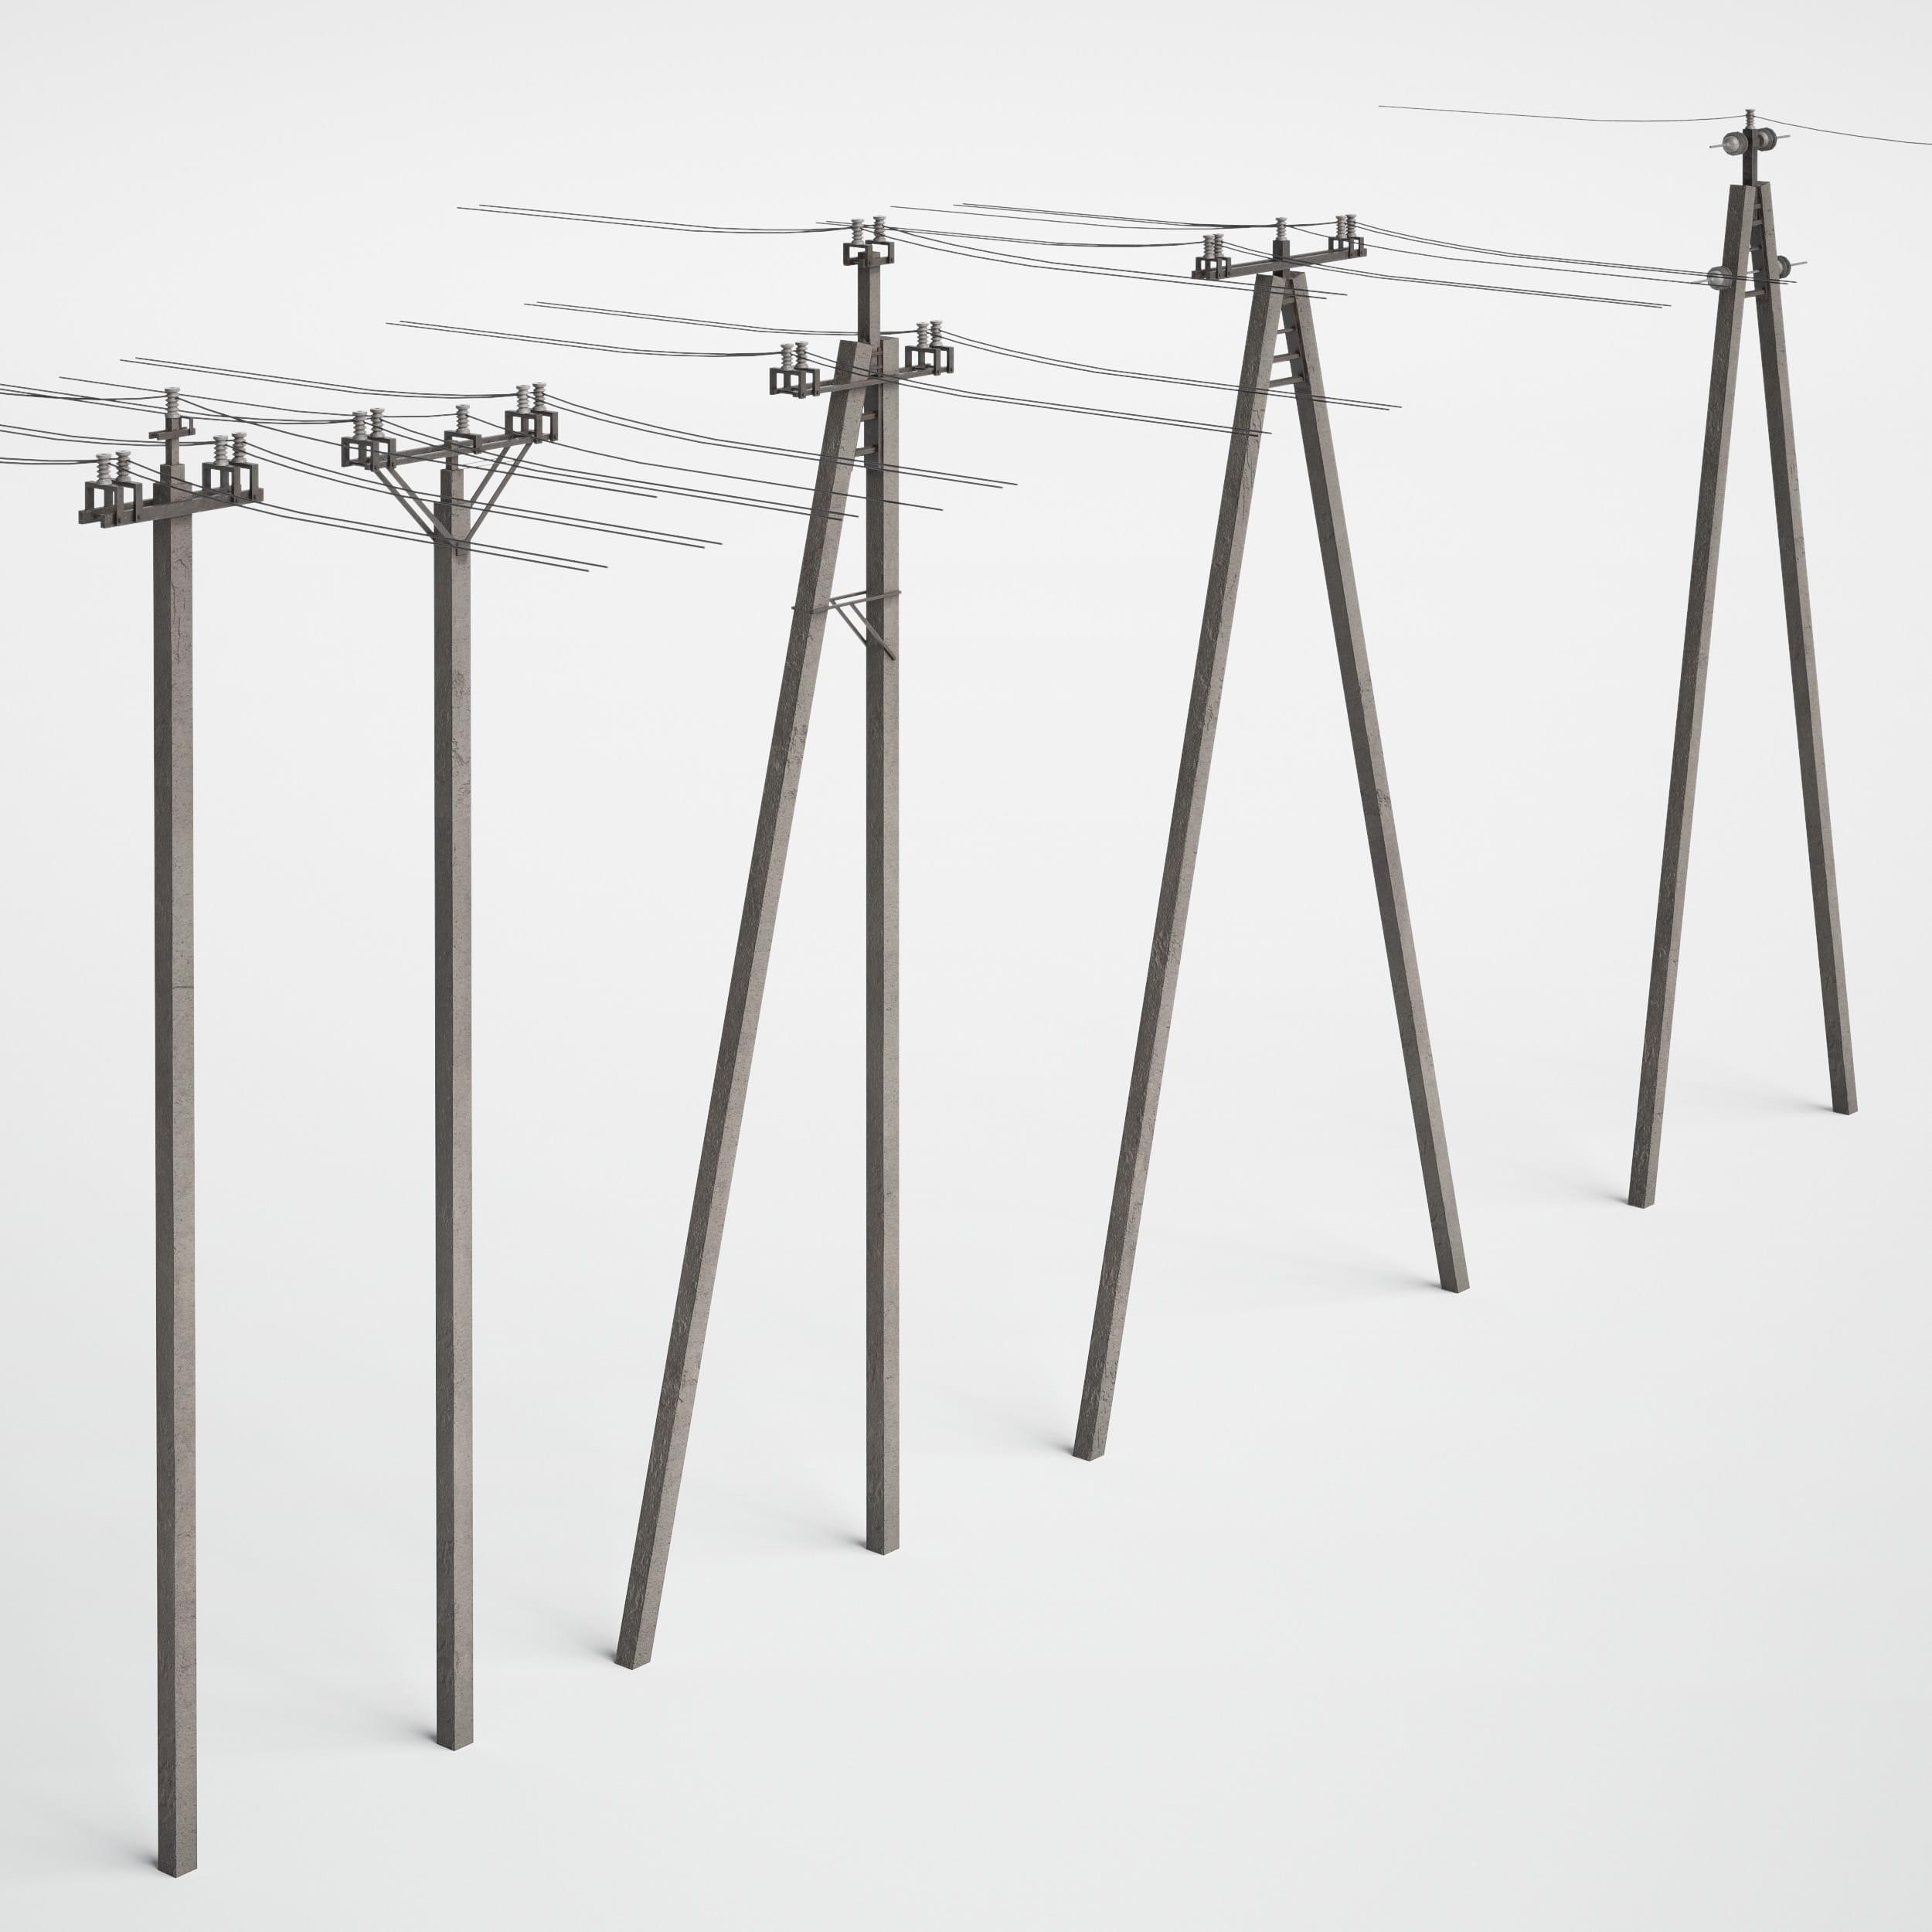 utility poles 30 AM227 Archmodels